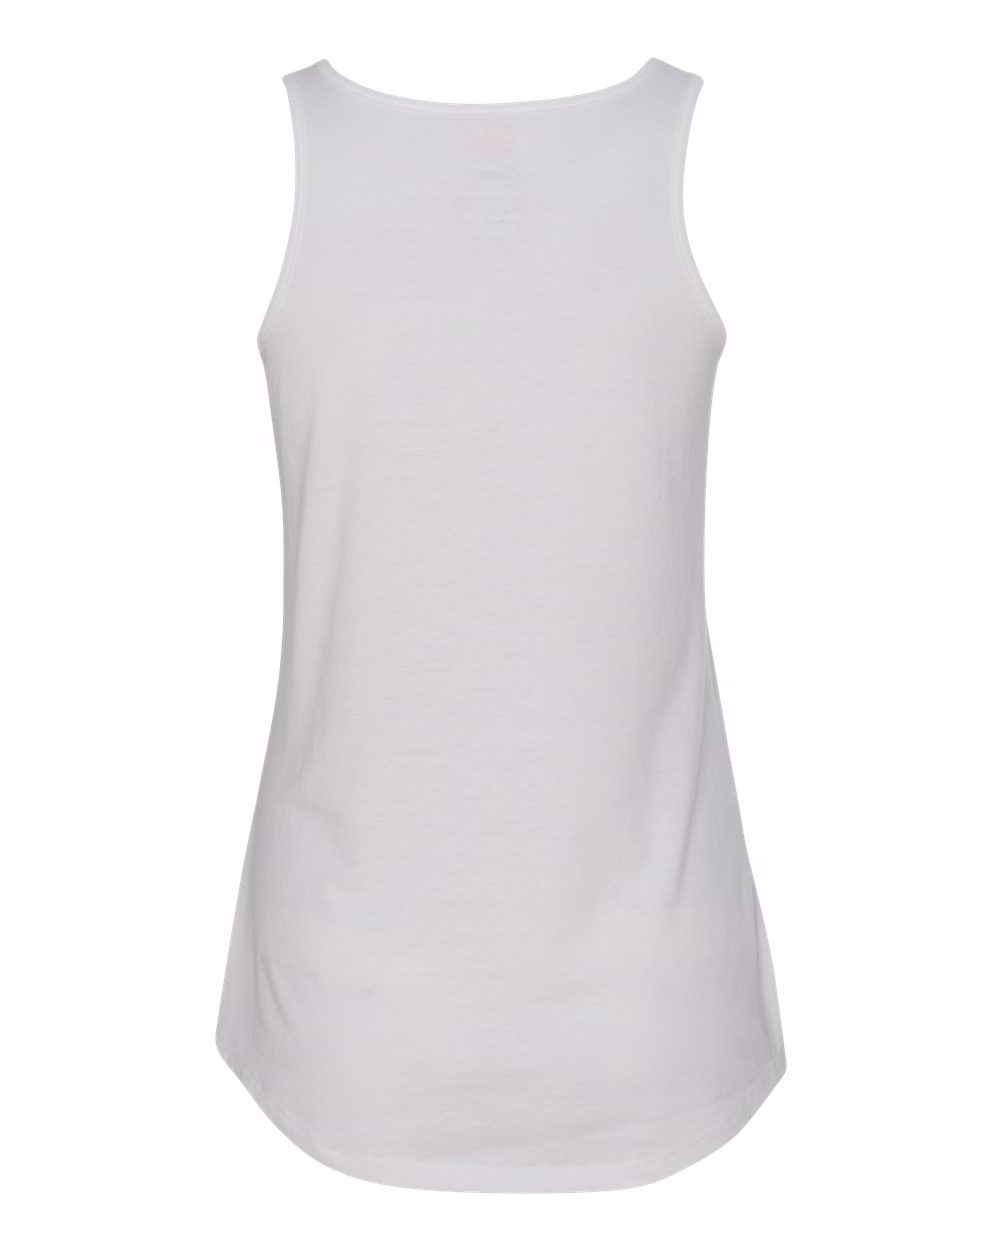 Hanes-Ladies-Moisture-Wicking-Shirts-Sleeveless-X-Temp-Women-039-s-Tank-Top thumbnail 22